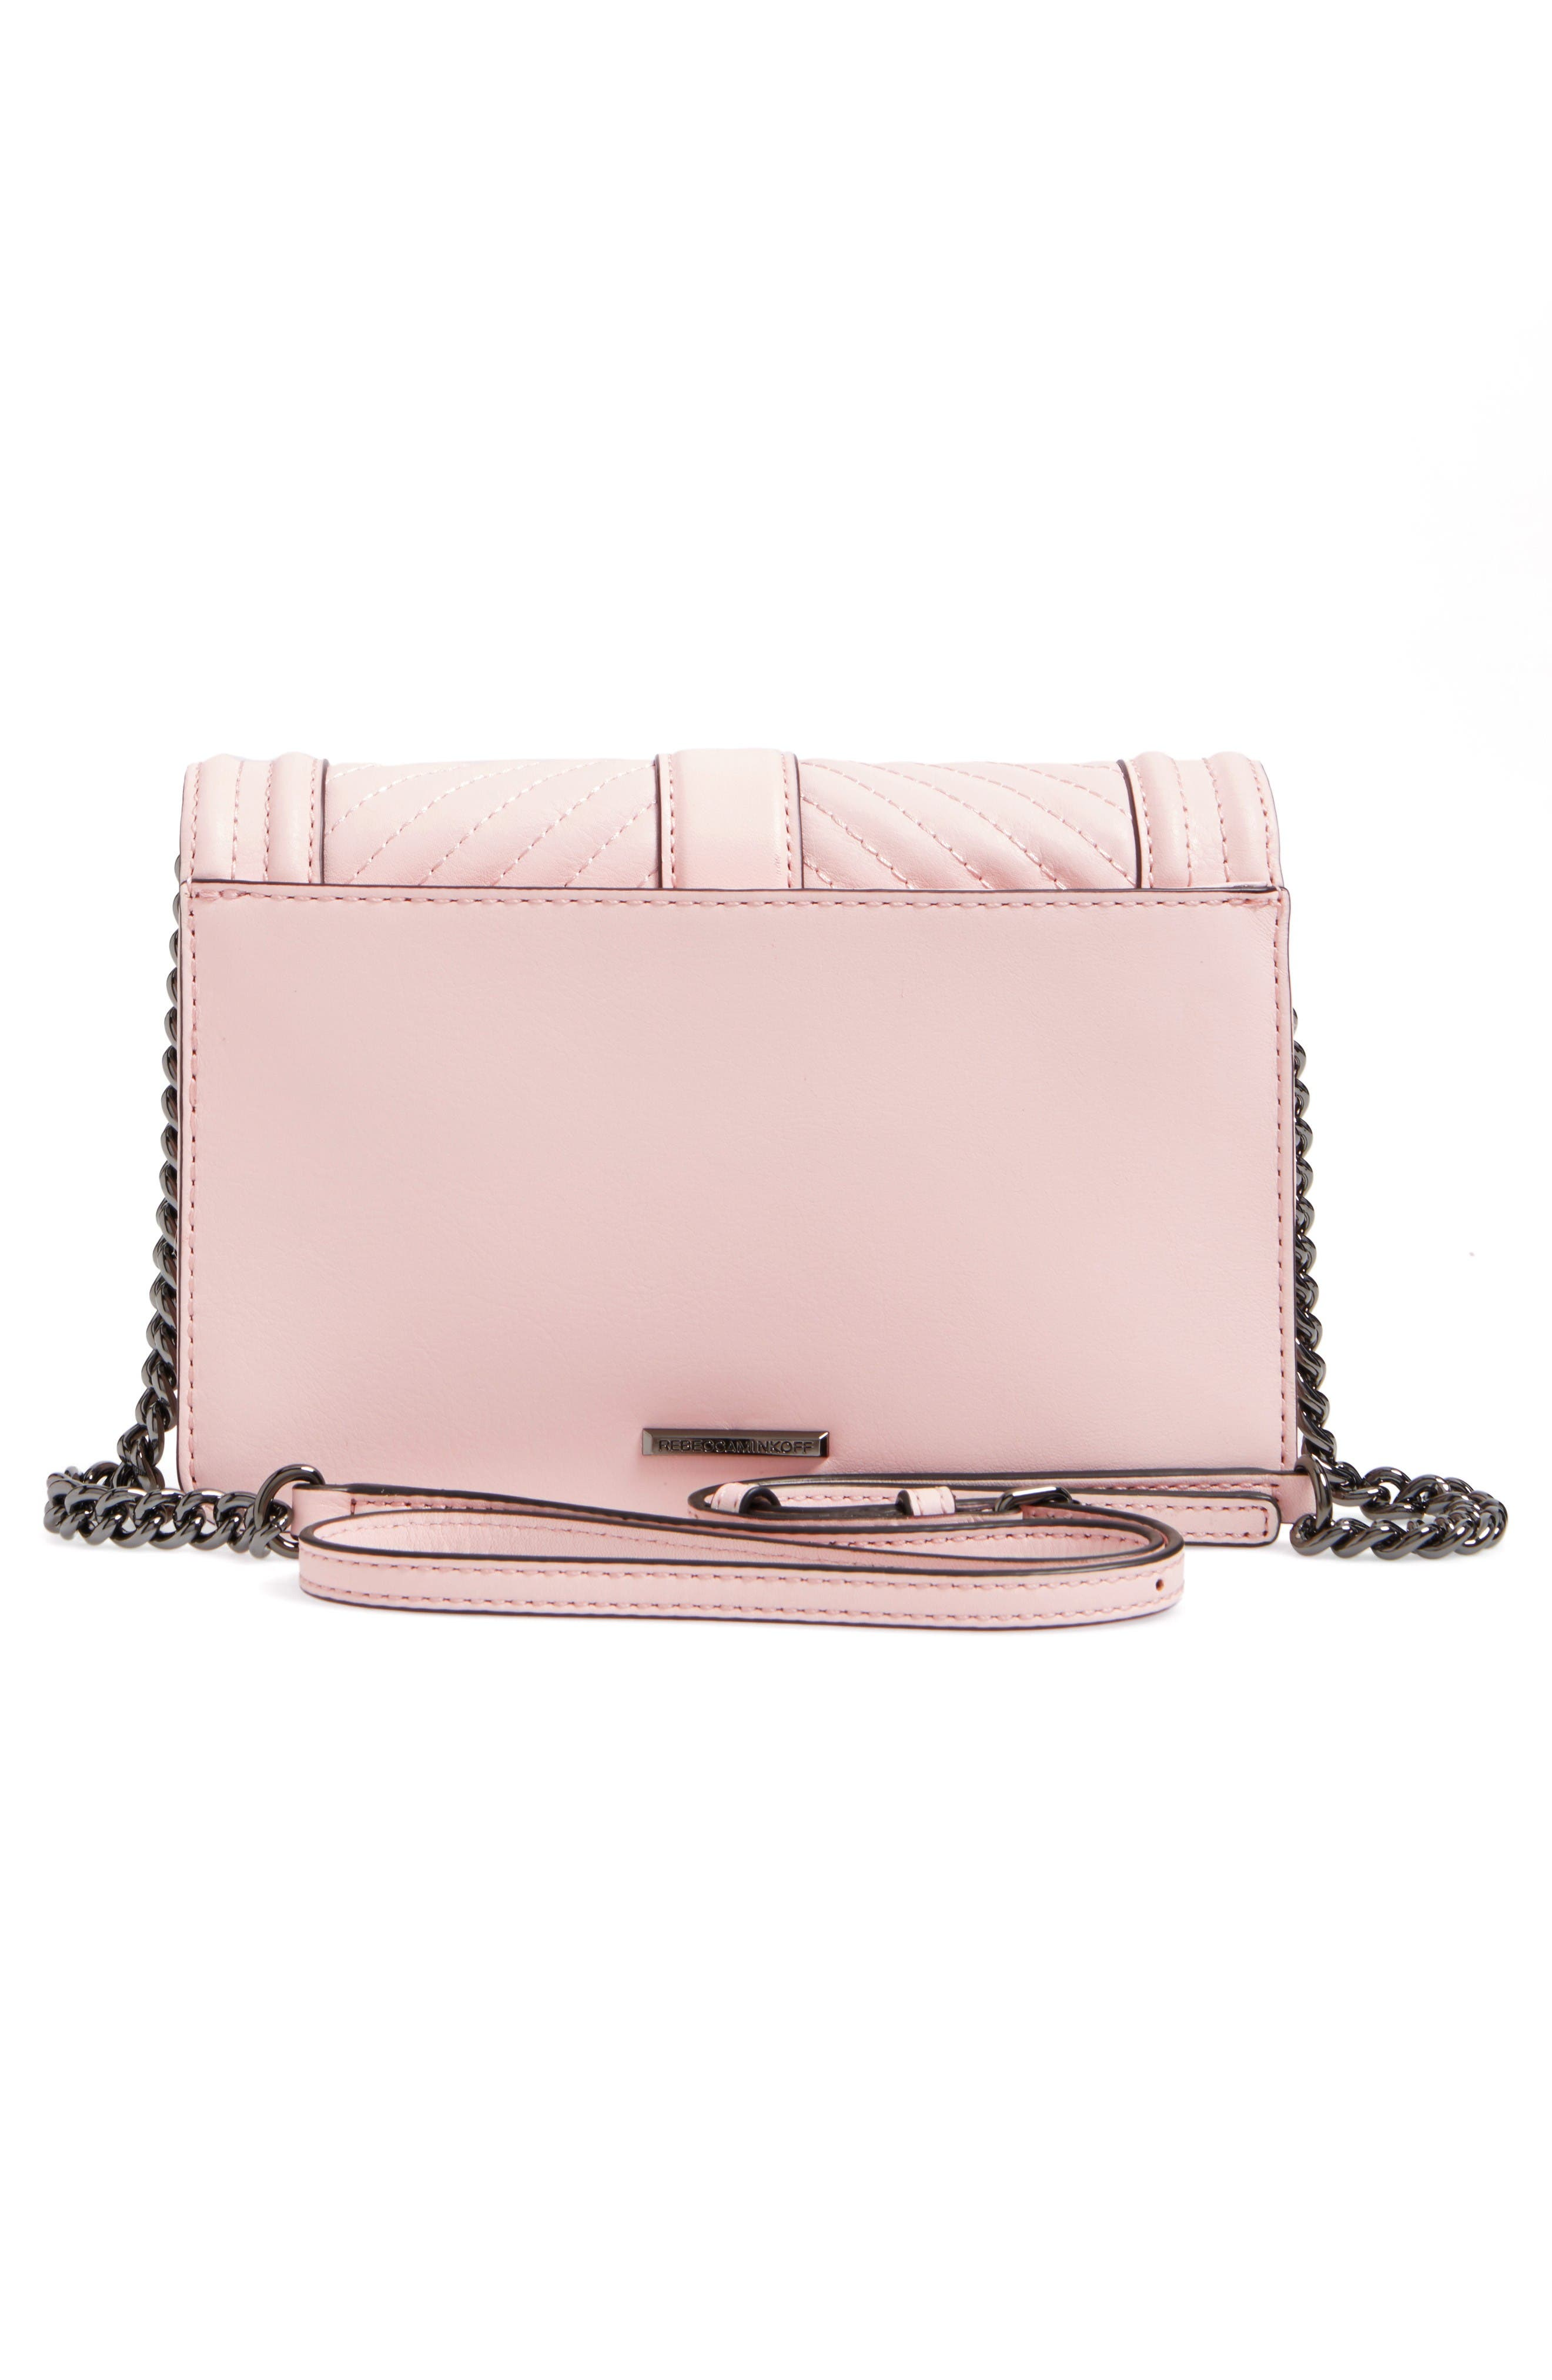 Small Love Leather Crossbody Bag,                             Alternate thumbnail 3, color,                             Soft Blush/ Gunmetal